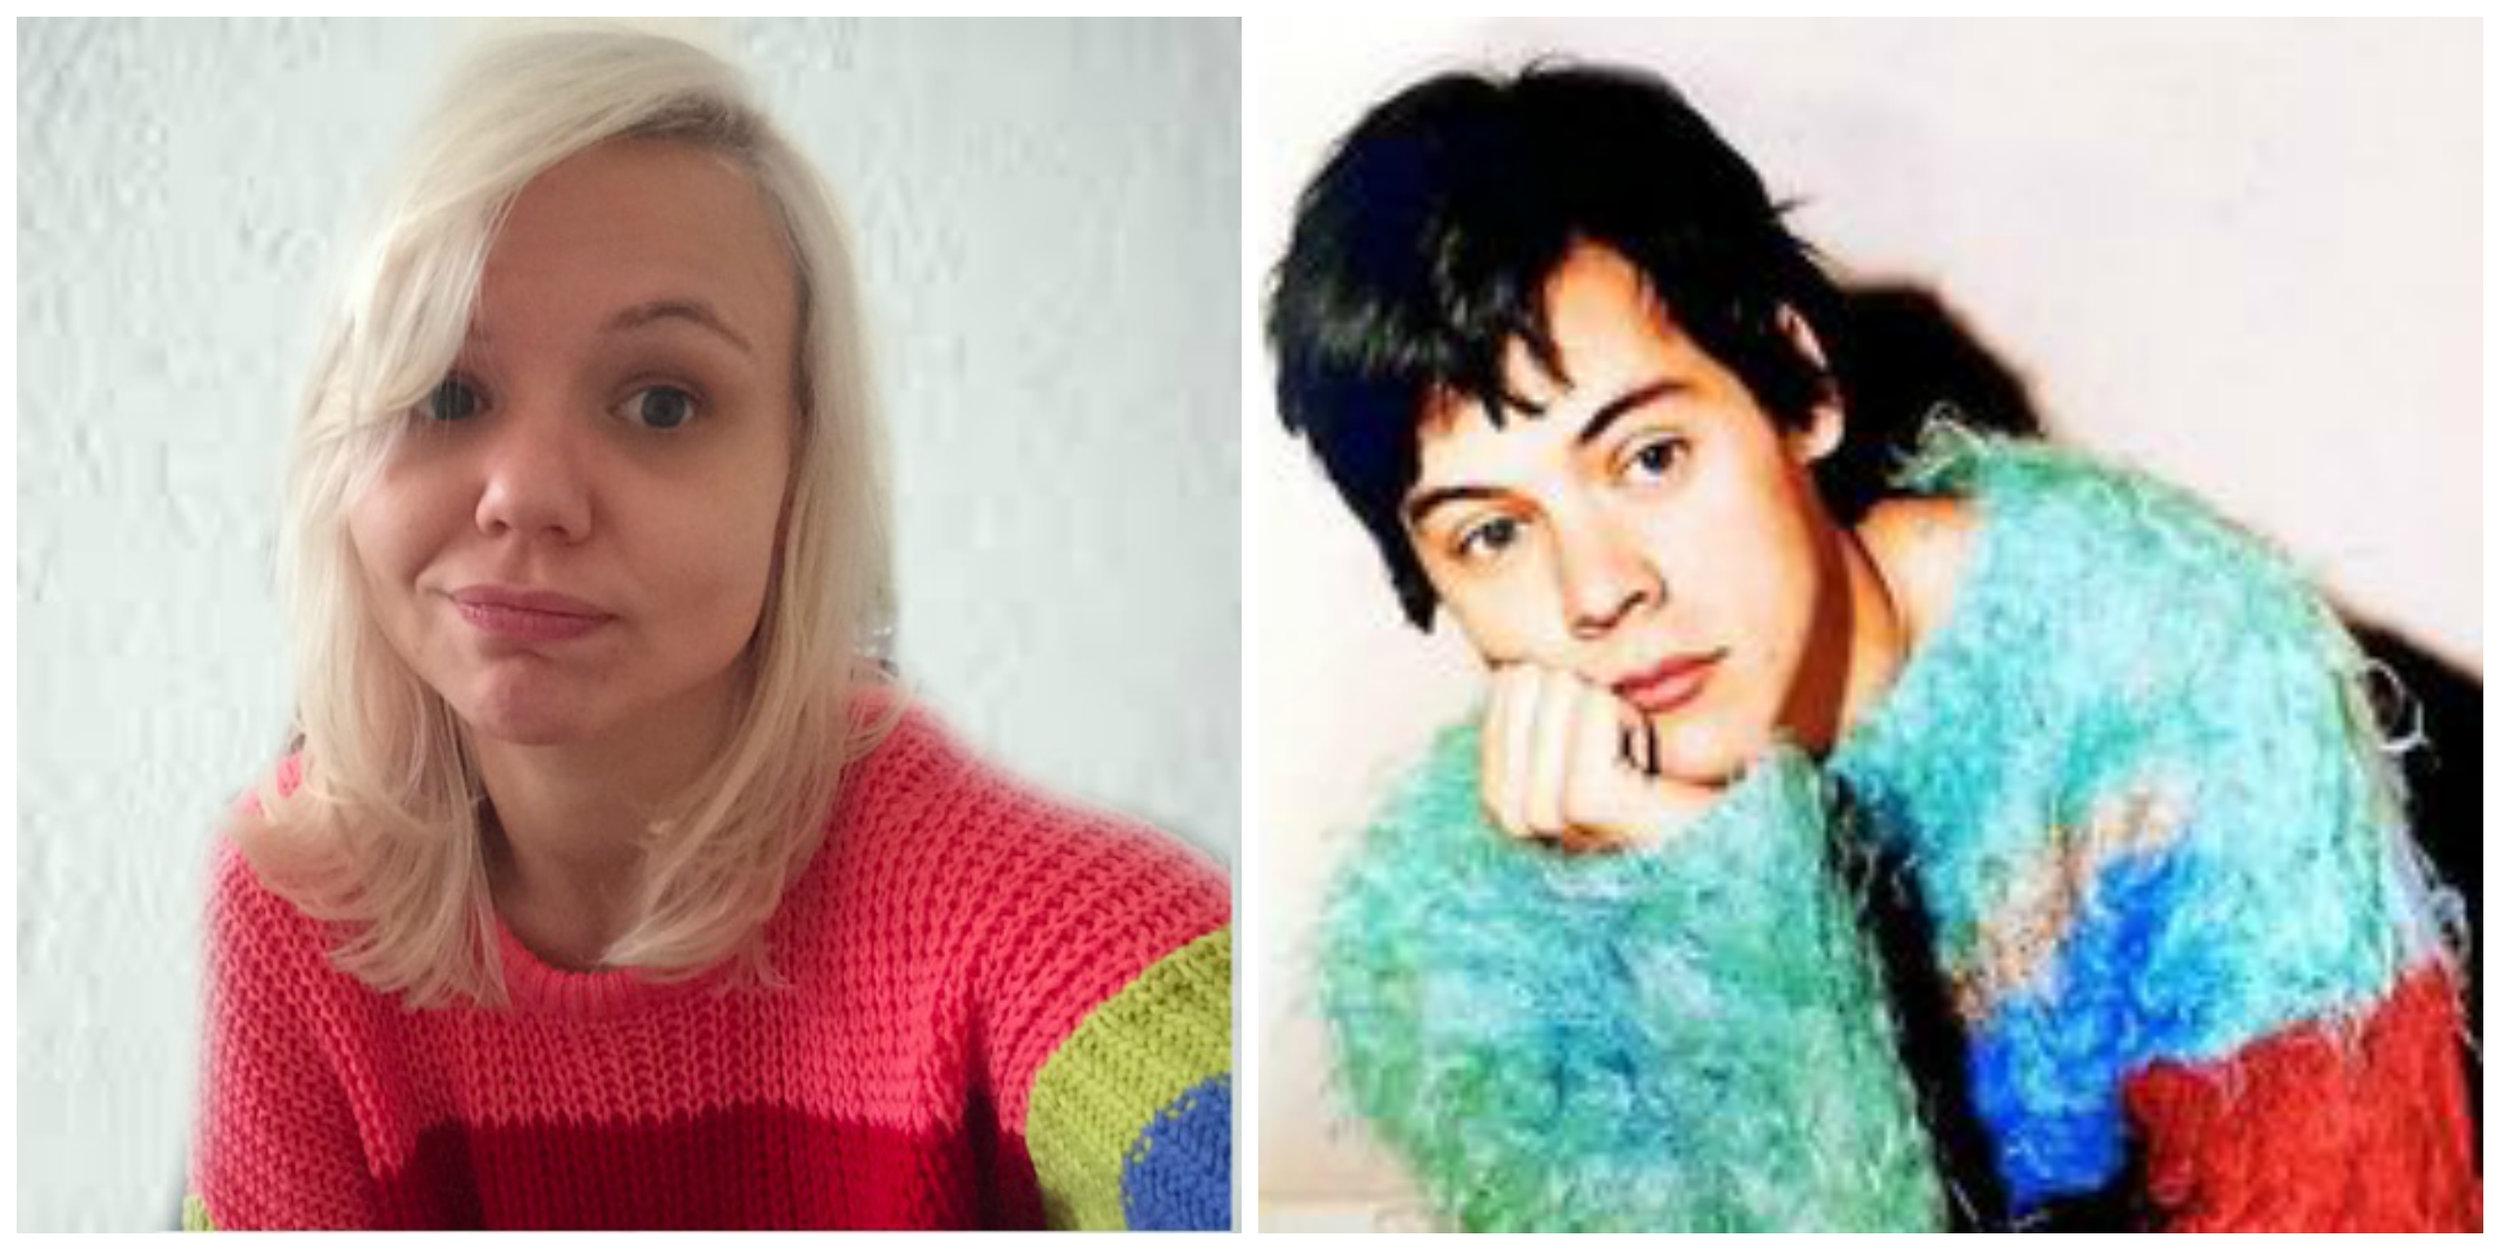 Alana Massey Harry Styles Color Block.jpg